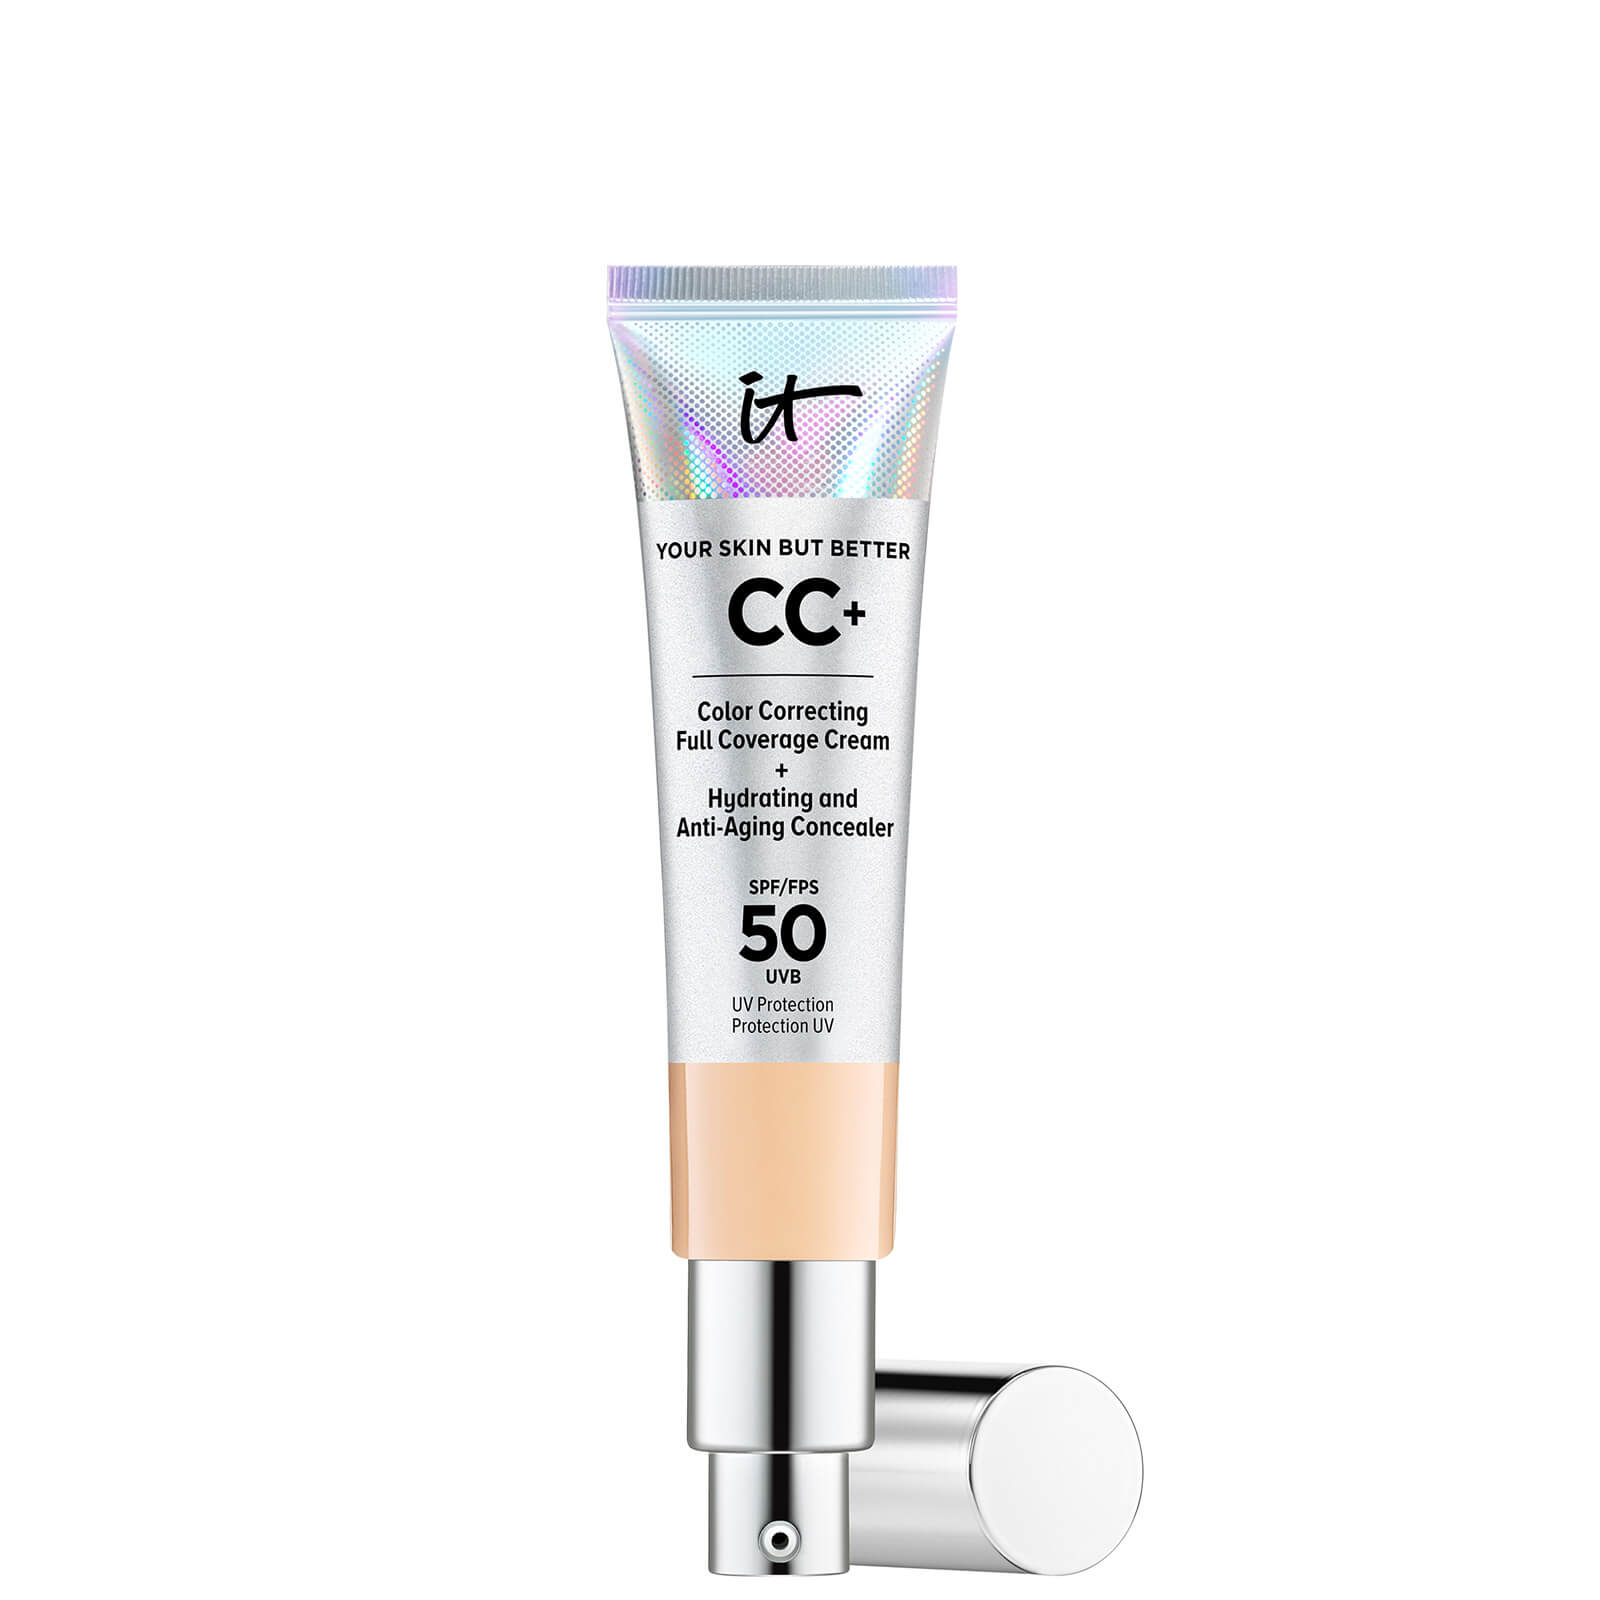 Купить IT Cosmetics Your Skin But Better CC+ Cream with SPF50 32ml (Various Shades) - Medium